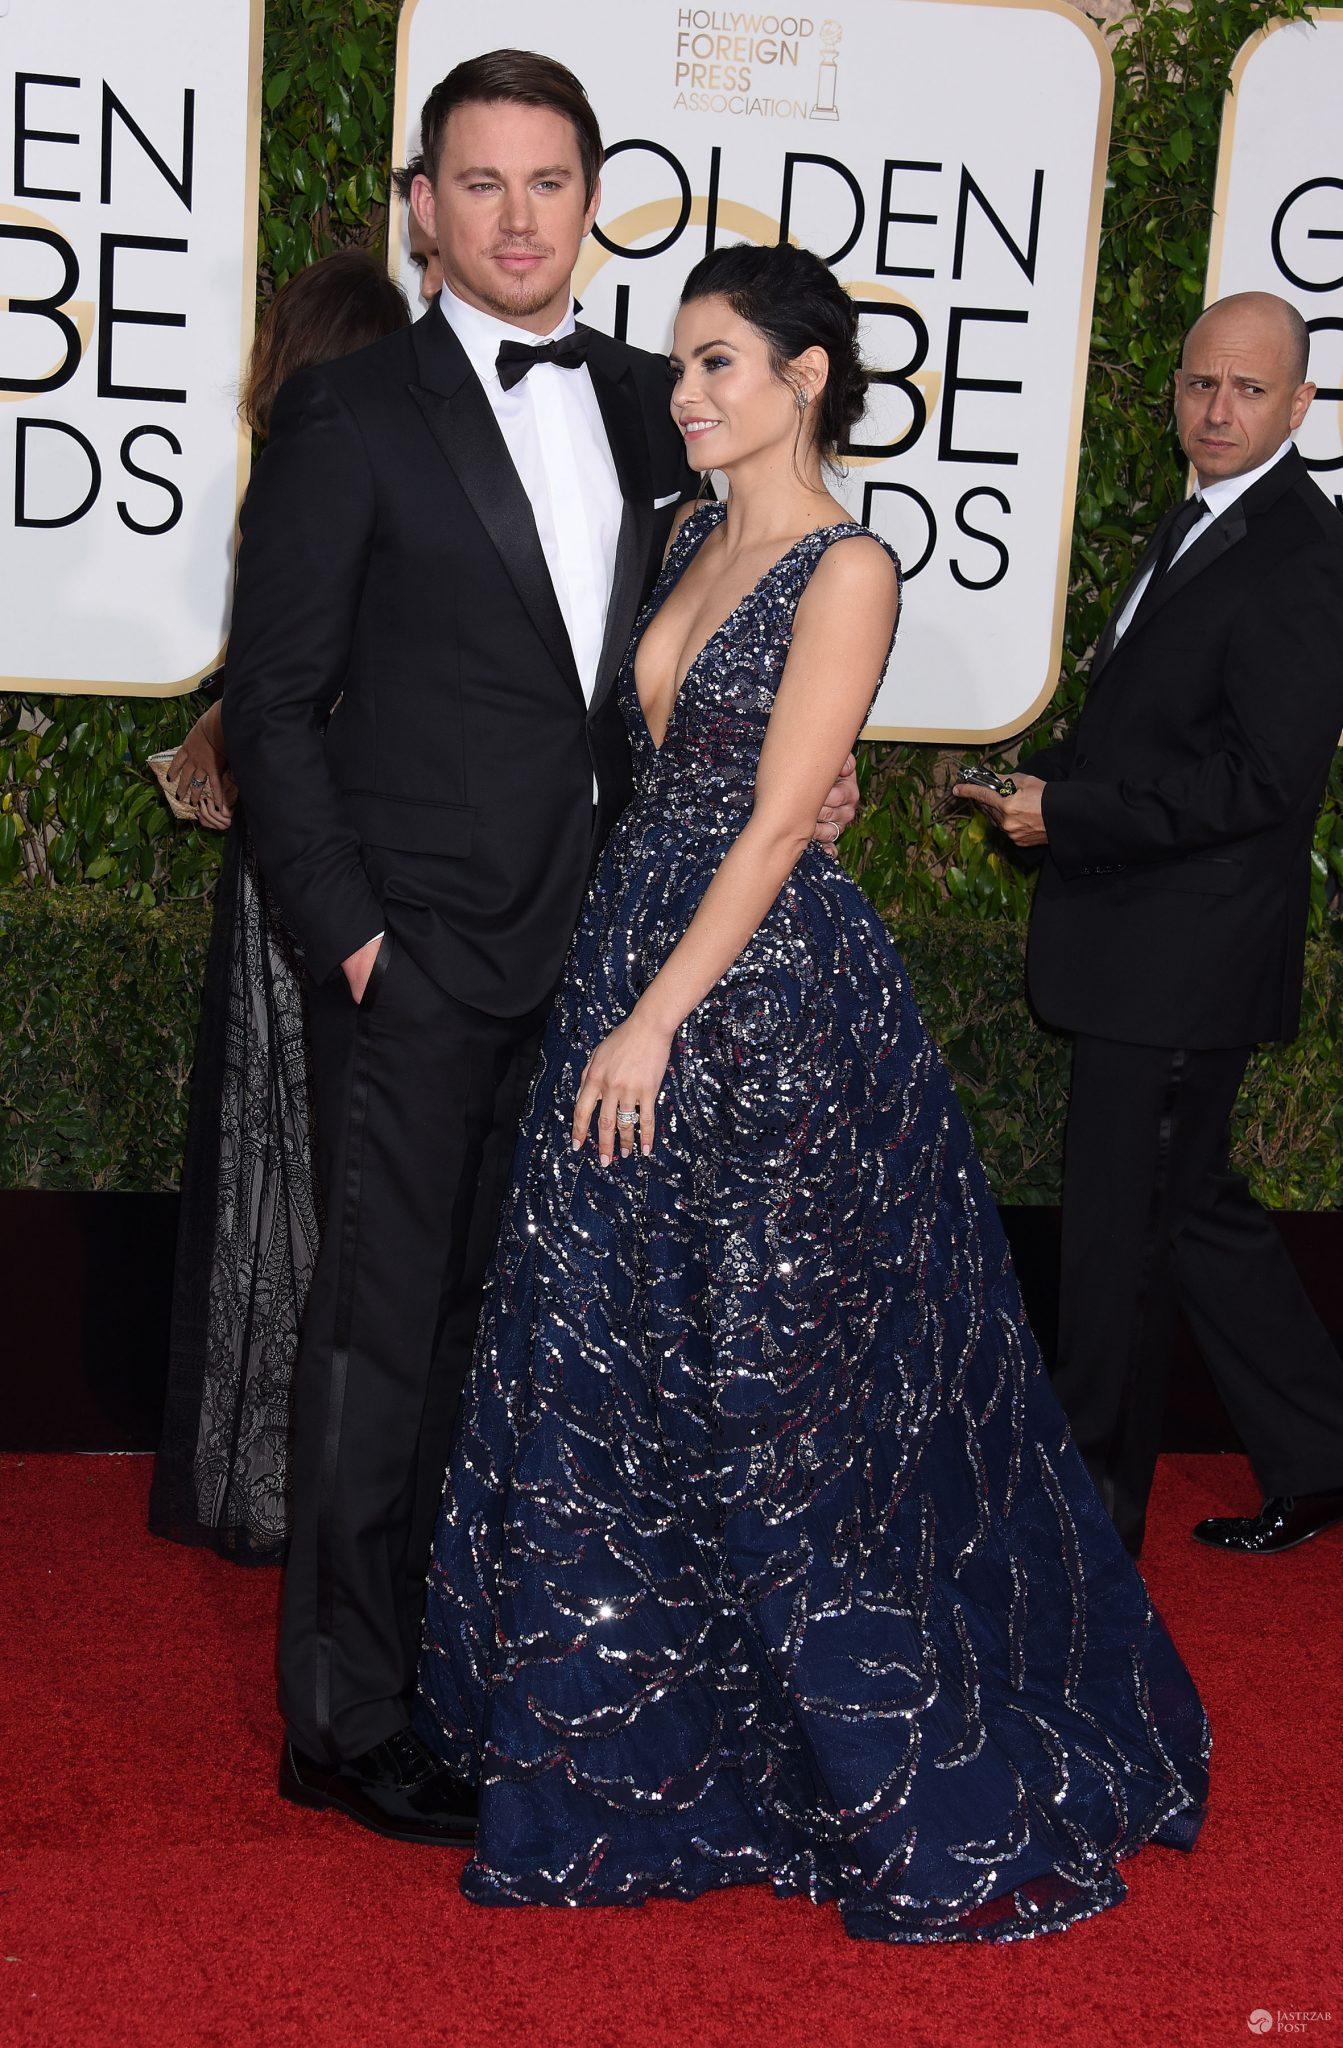 Channing Tatum i jego żona Jenna Dewan-Tatum (w sukni Zuhair Murad), Złote Globy 2016 (fot. ONS)